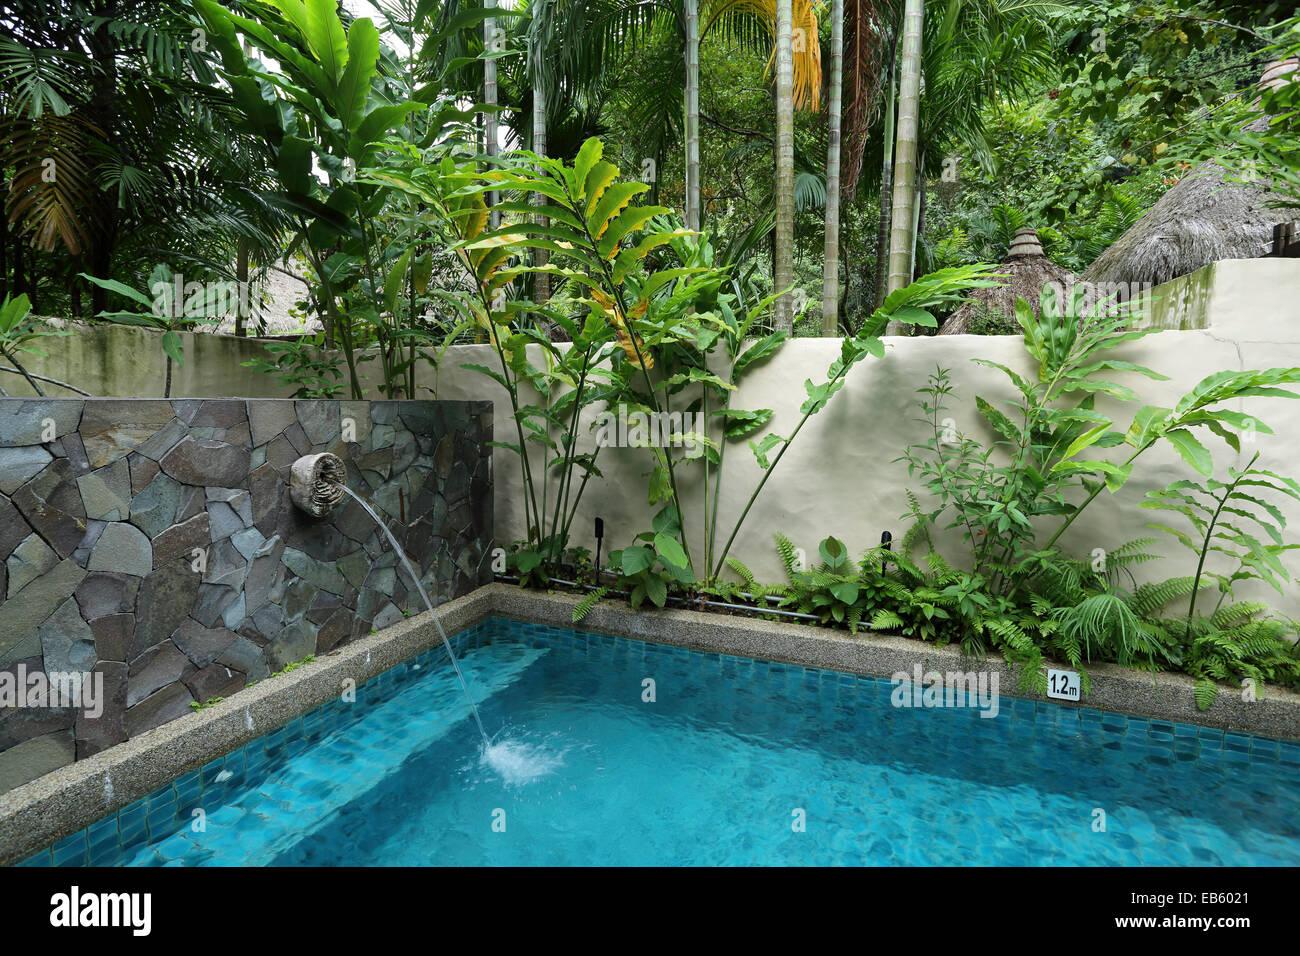 A Private Swimming Pool At The Banjaran Hotspring Retreat Near Ipoh Stock Photo Royalty Free